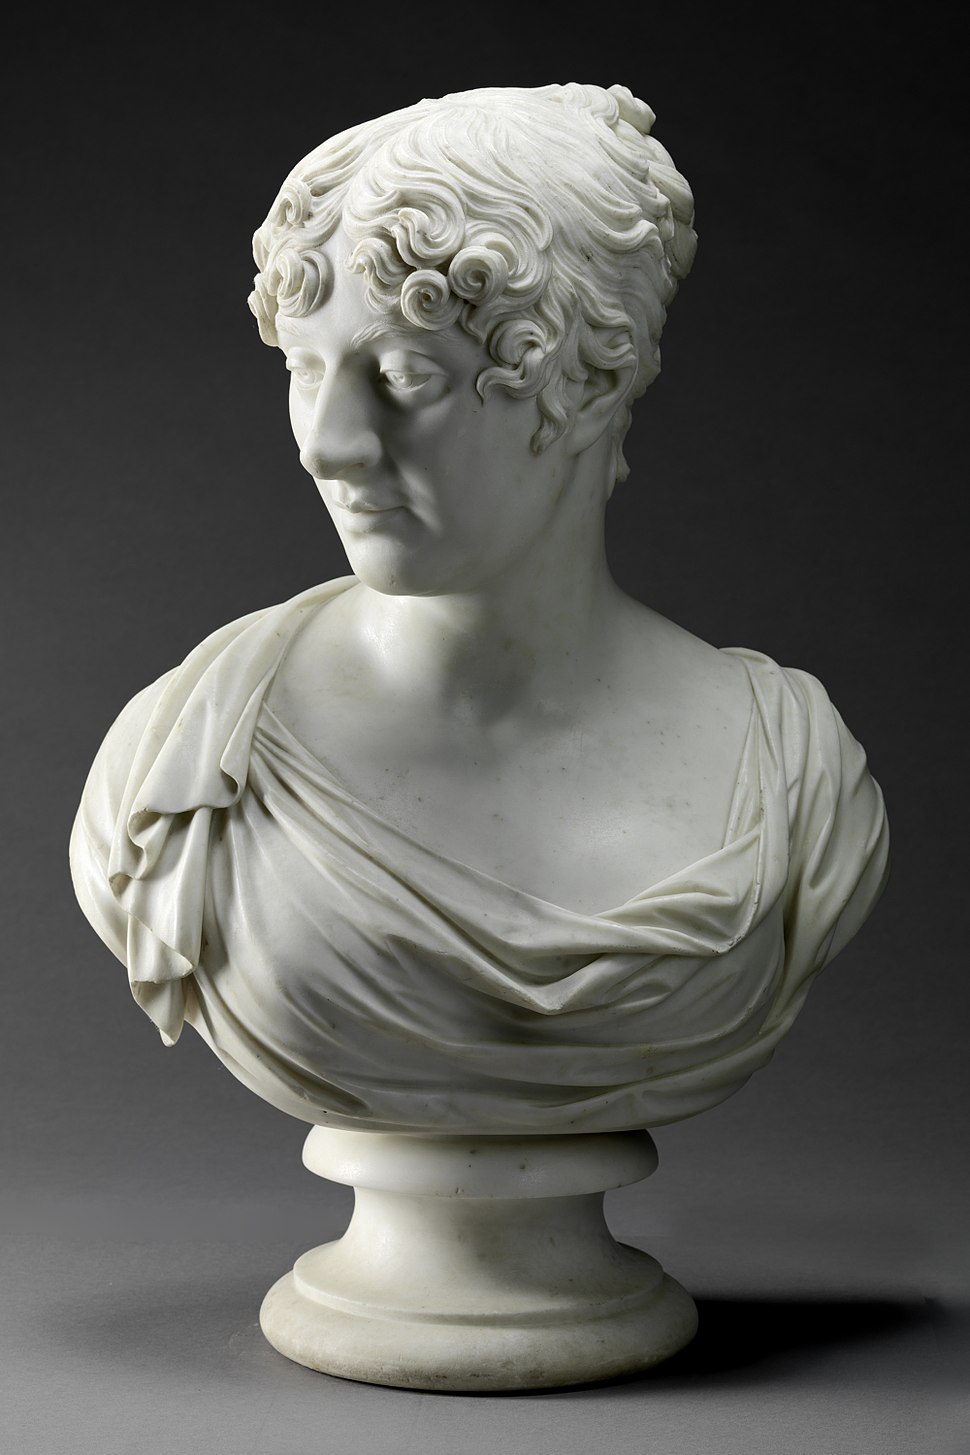 Charlotte, 4th Duchess of Richmond (1768-1842), by Joseph Nollekens